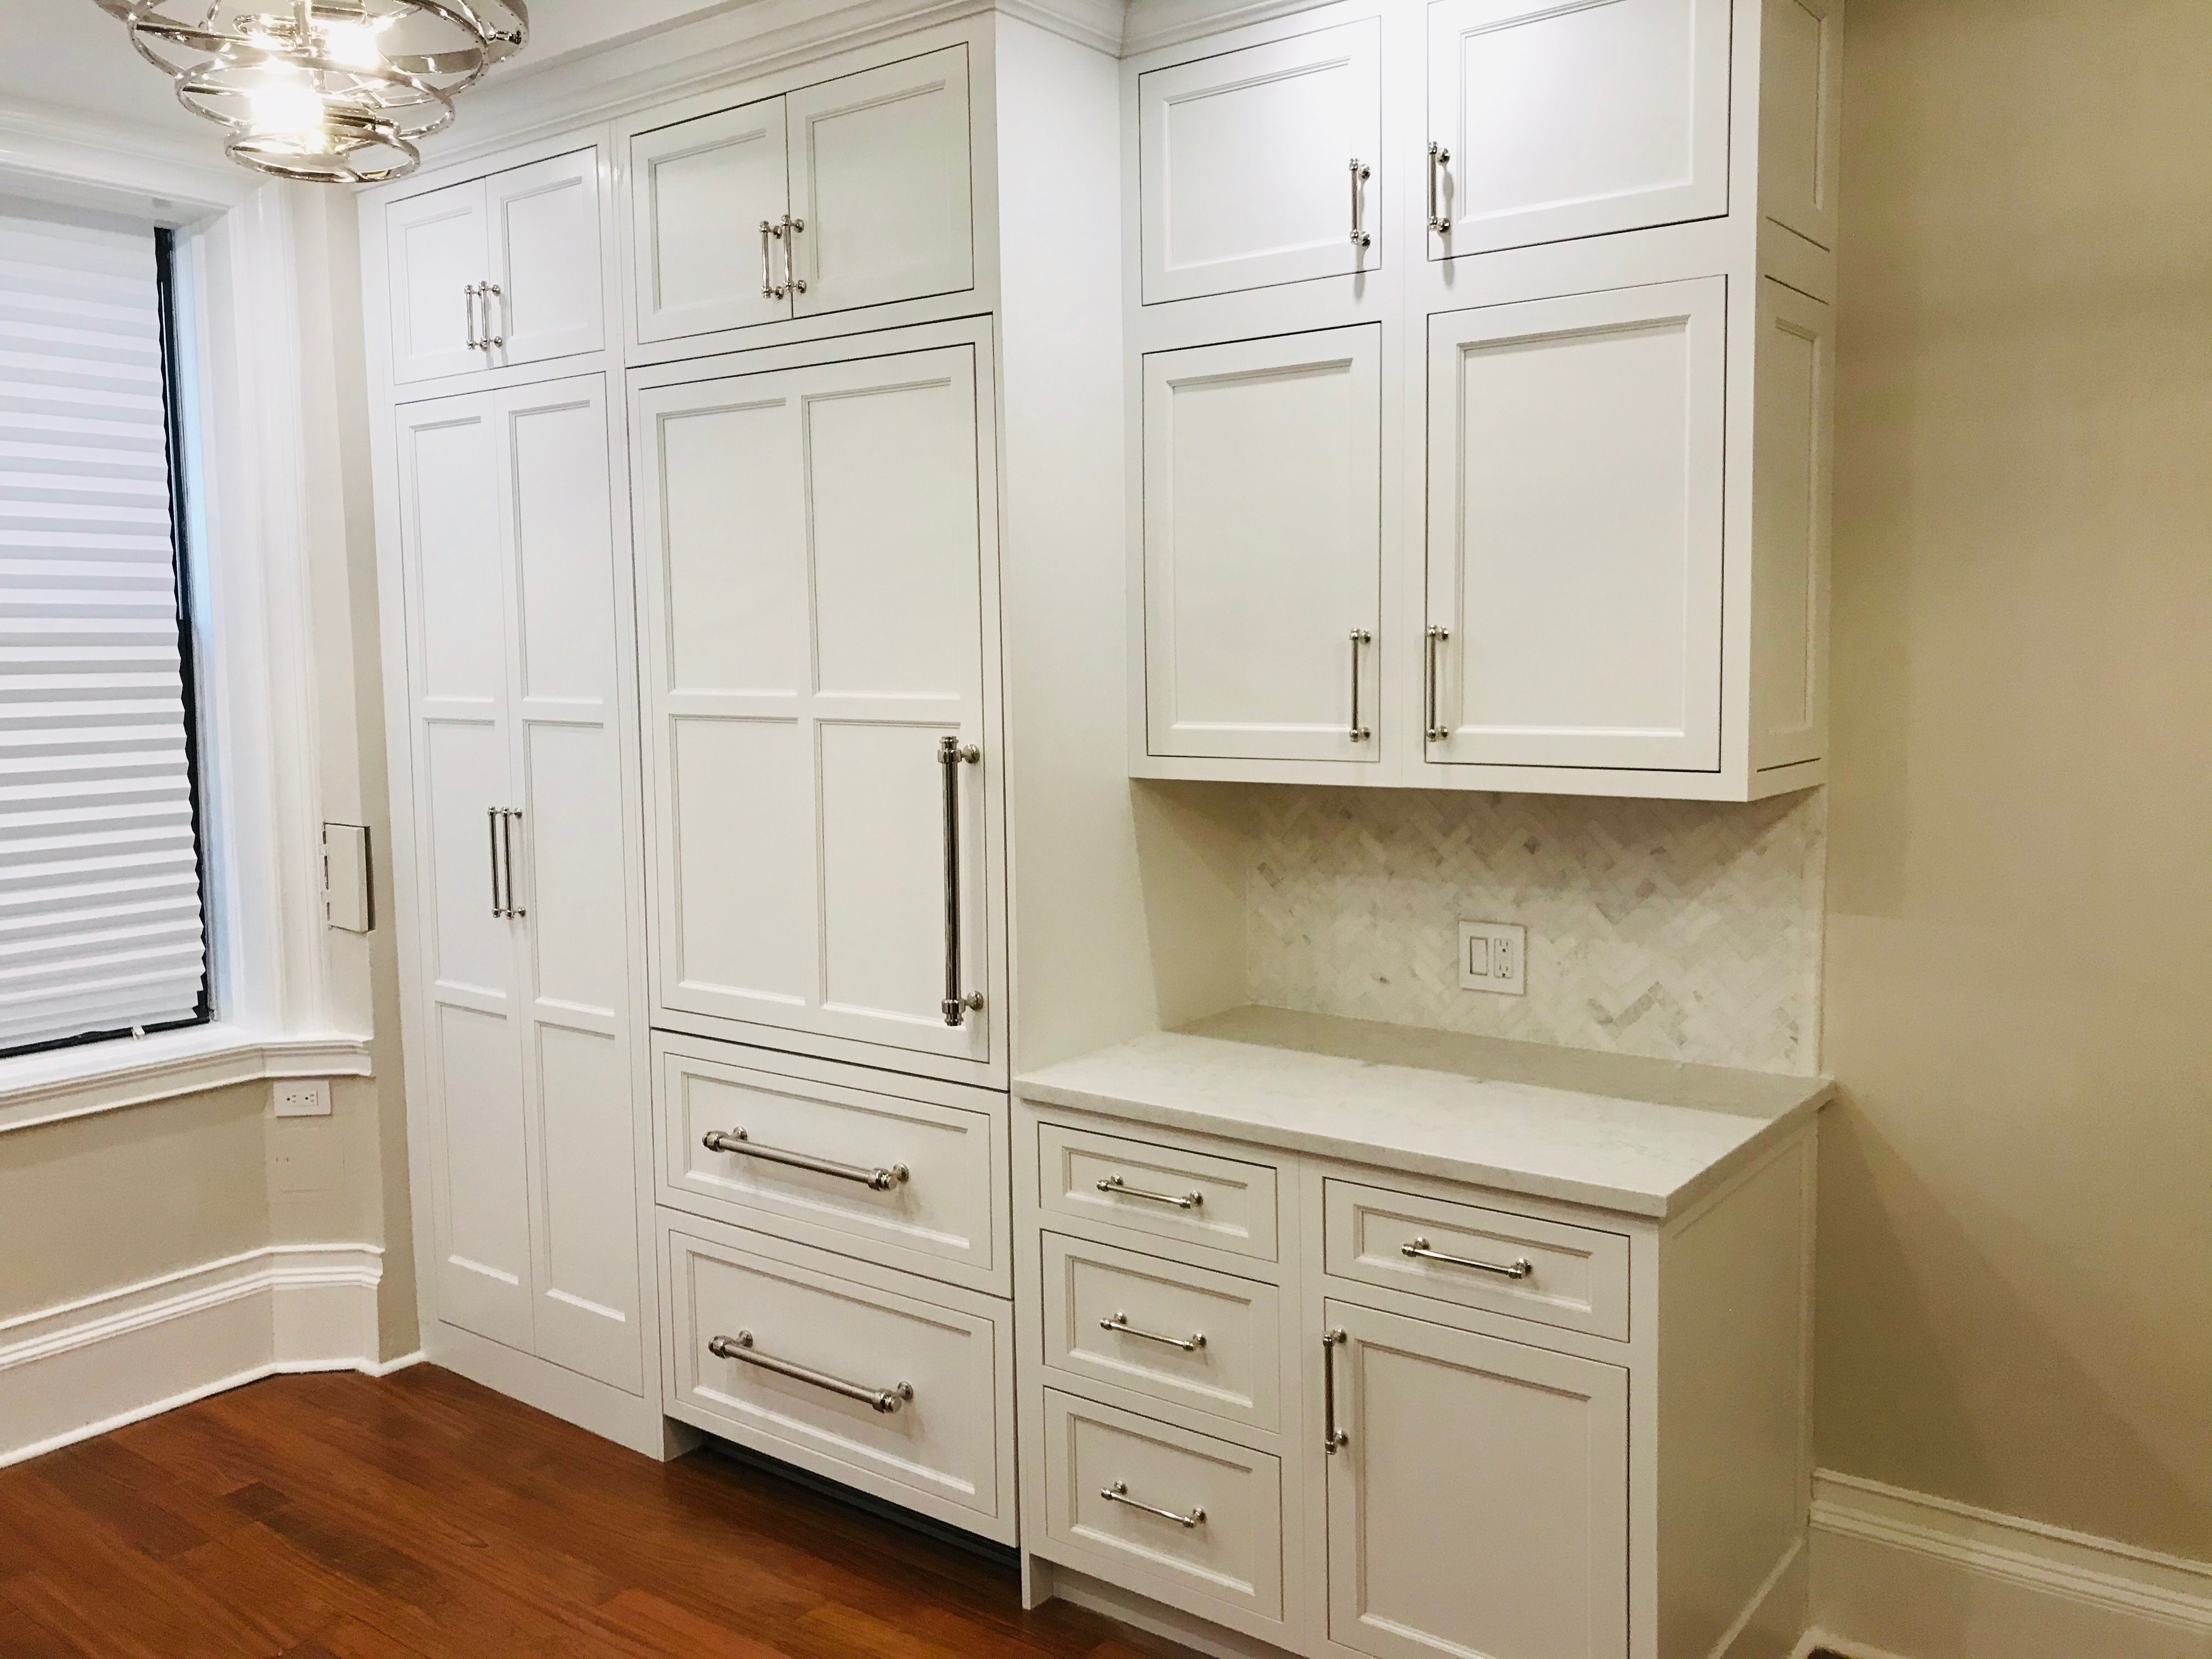 Custom refrigerator panels using starmark inset